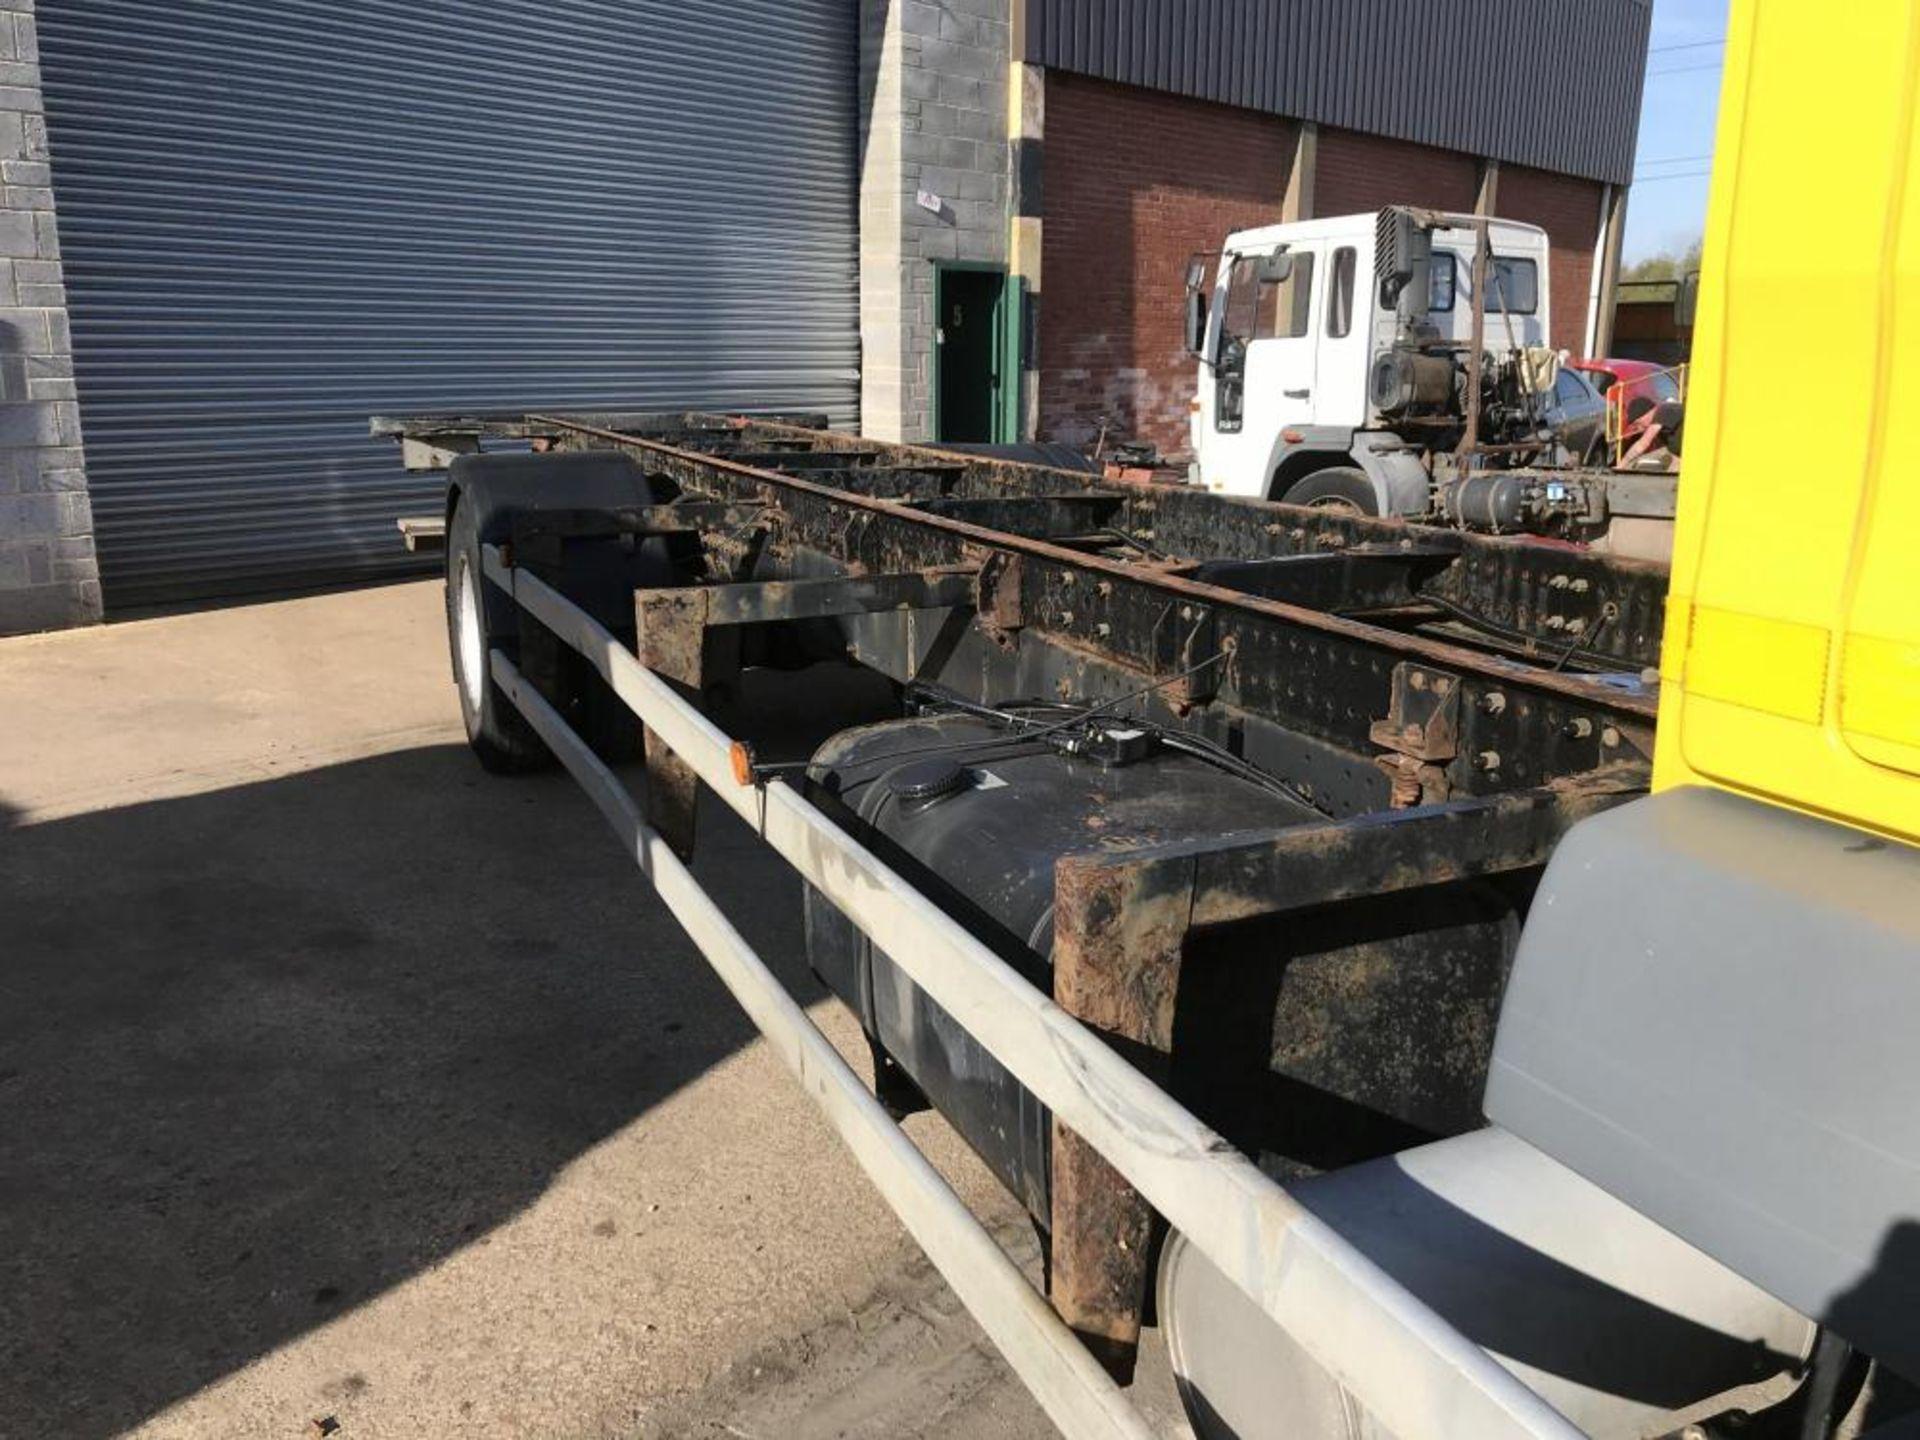 2012/12 REG MAN TG-M 18.250 4X2 LL L 6.9L DIESEL SLEEPER CAB AUTO GEARBOX GOOD CONDITION *PLUS VAT* - Image 6 of 15